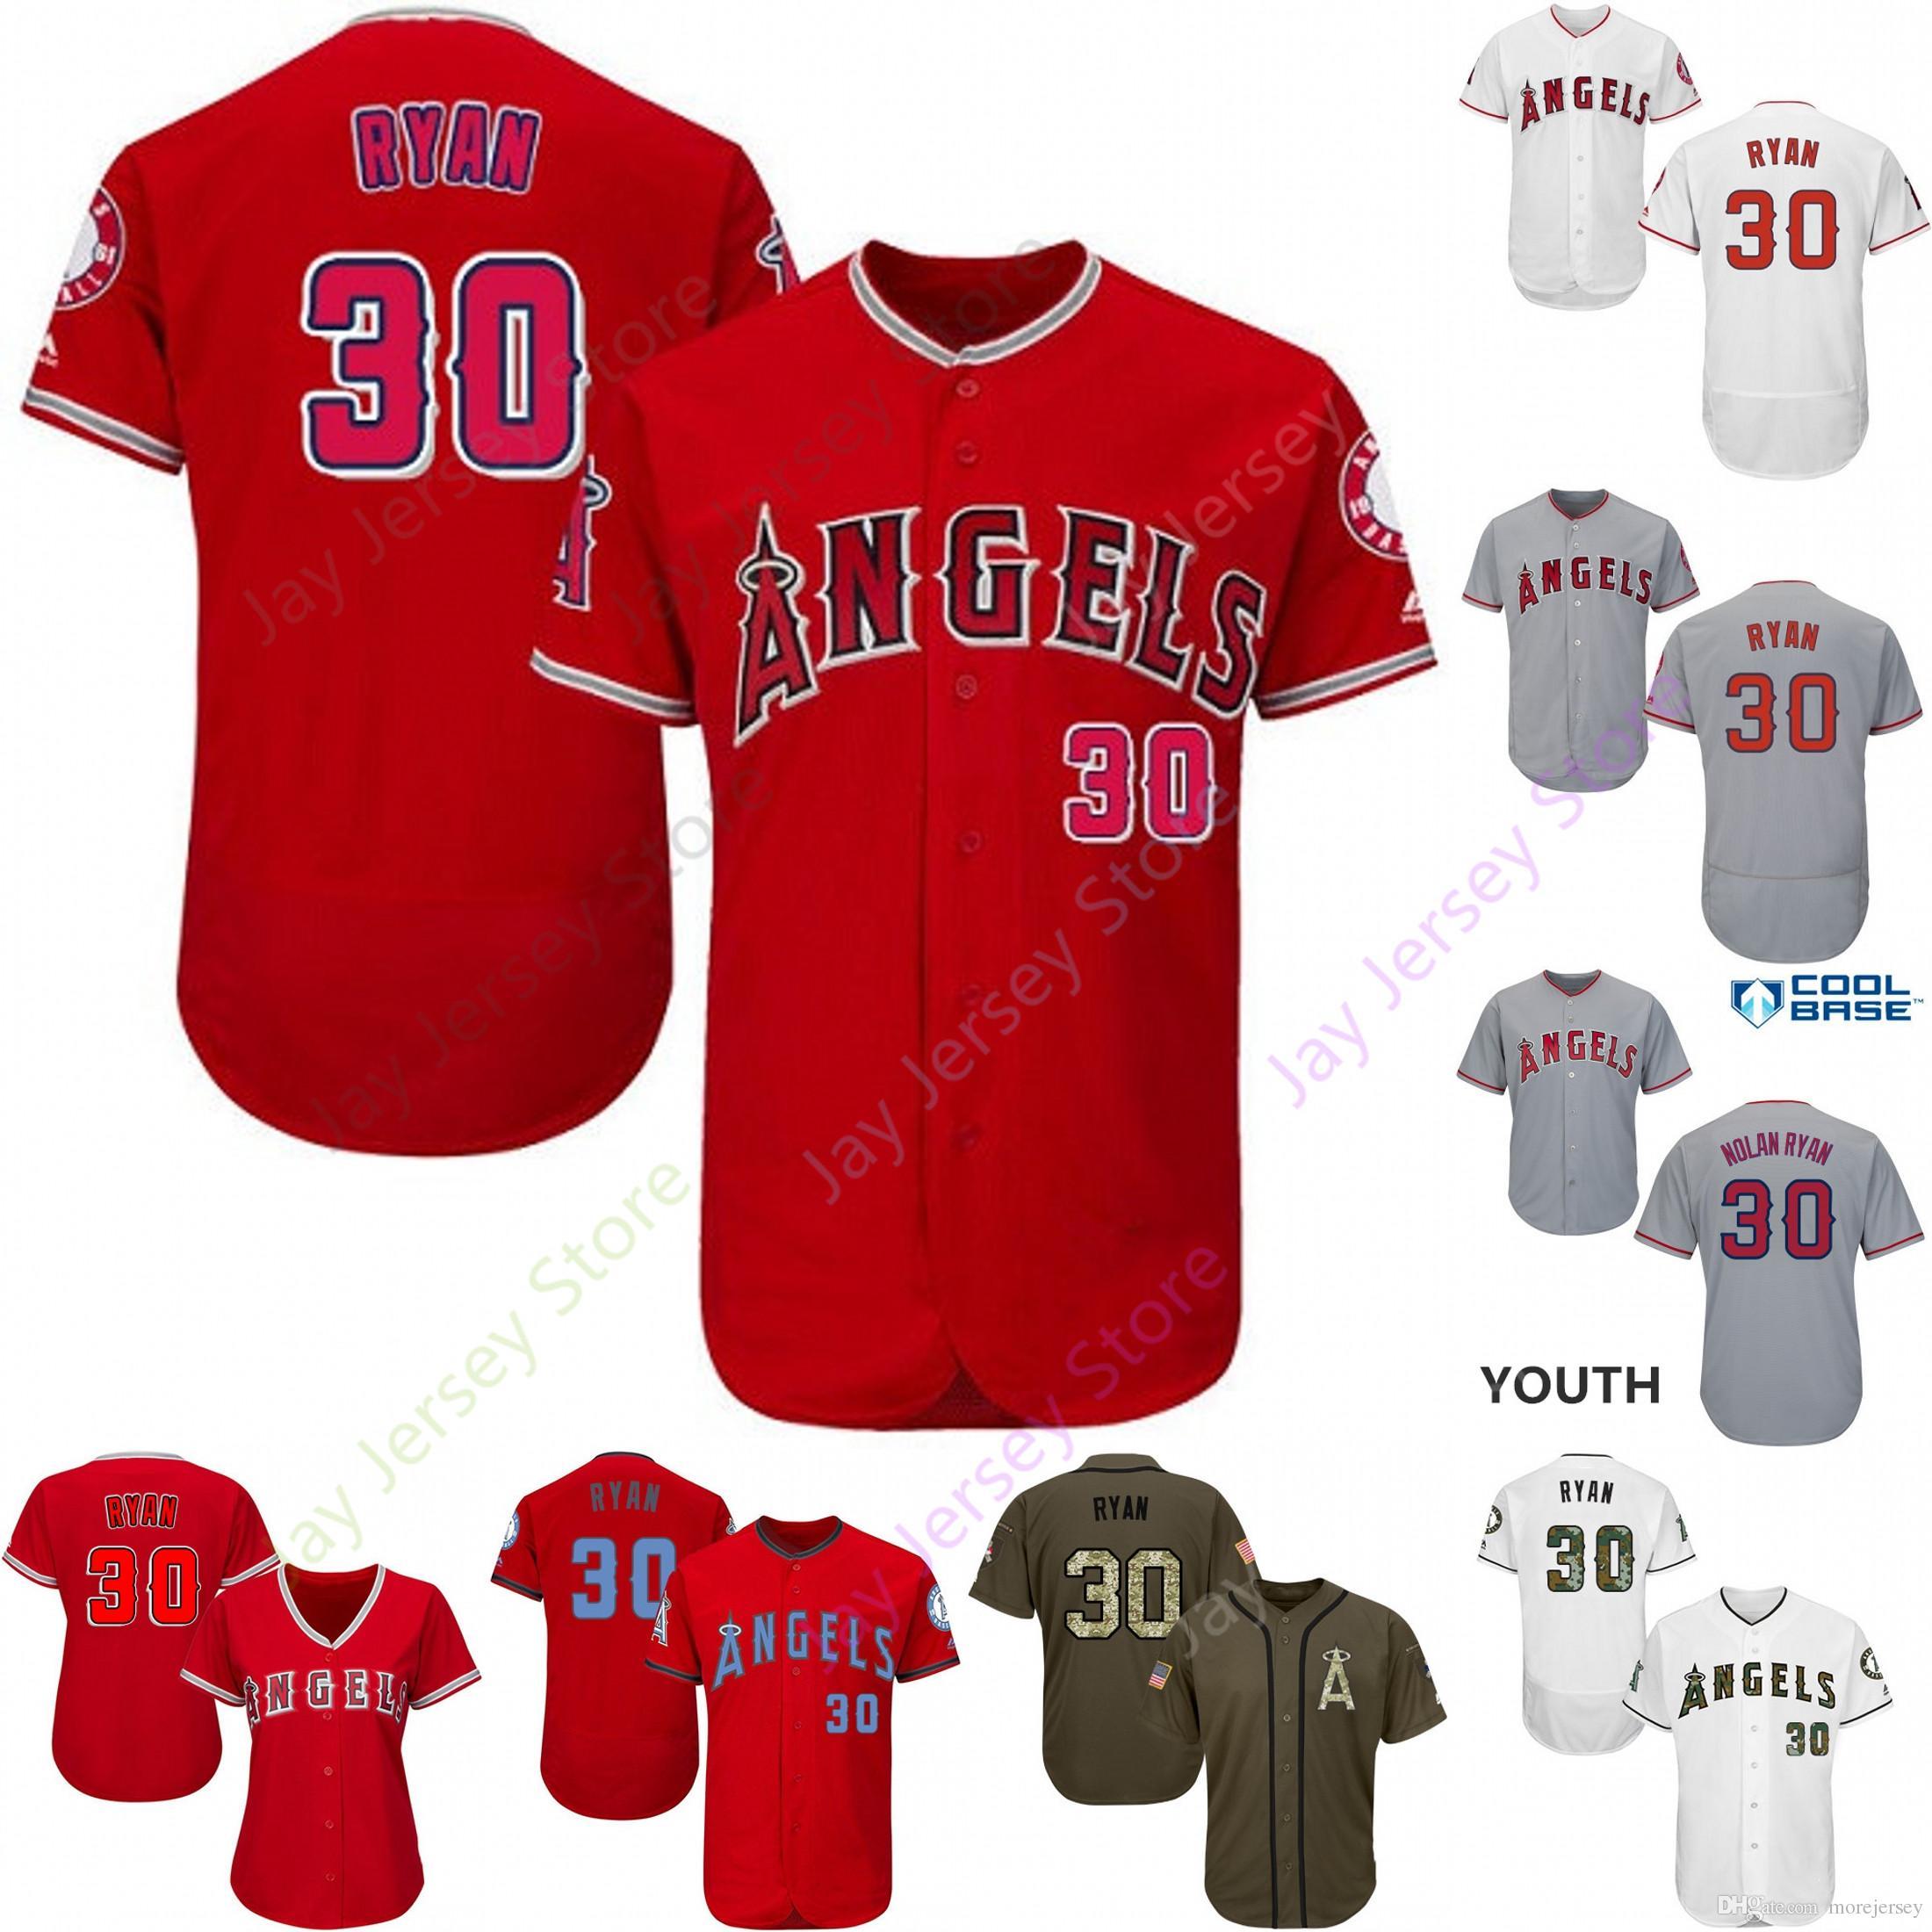 timeless design c4cd4 d5980 2019 Los Angeles 30 Nolan Ryan Jersey Angels of Anaheim Jerseys CoolBase  Flexbase Home Away White Black Red Grey Pullover Button Men Women